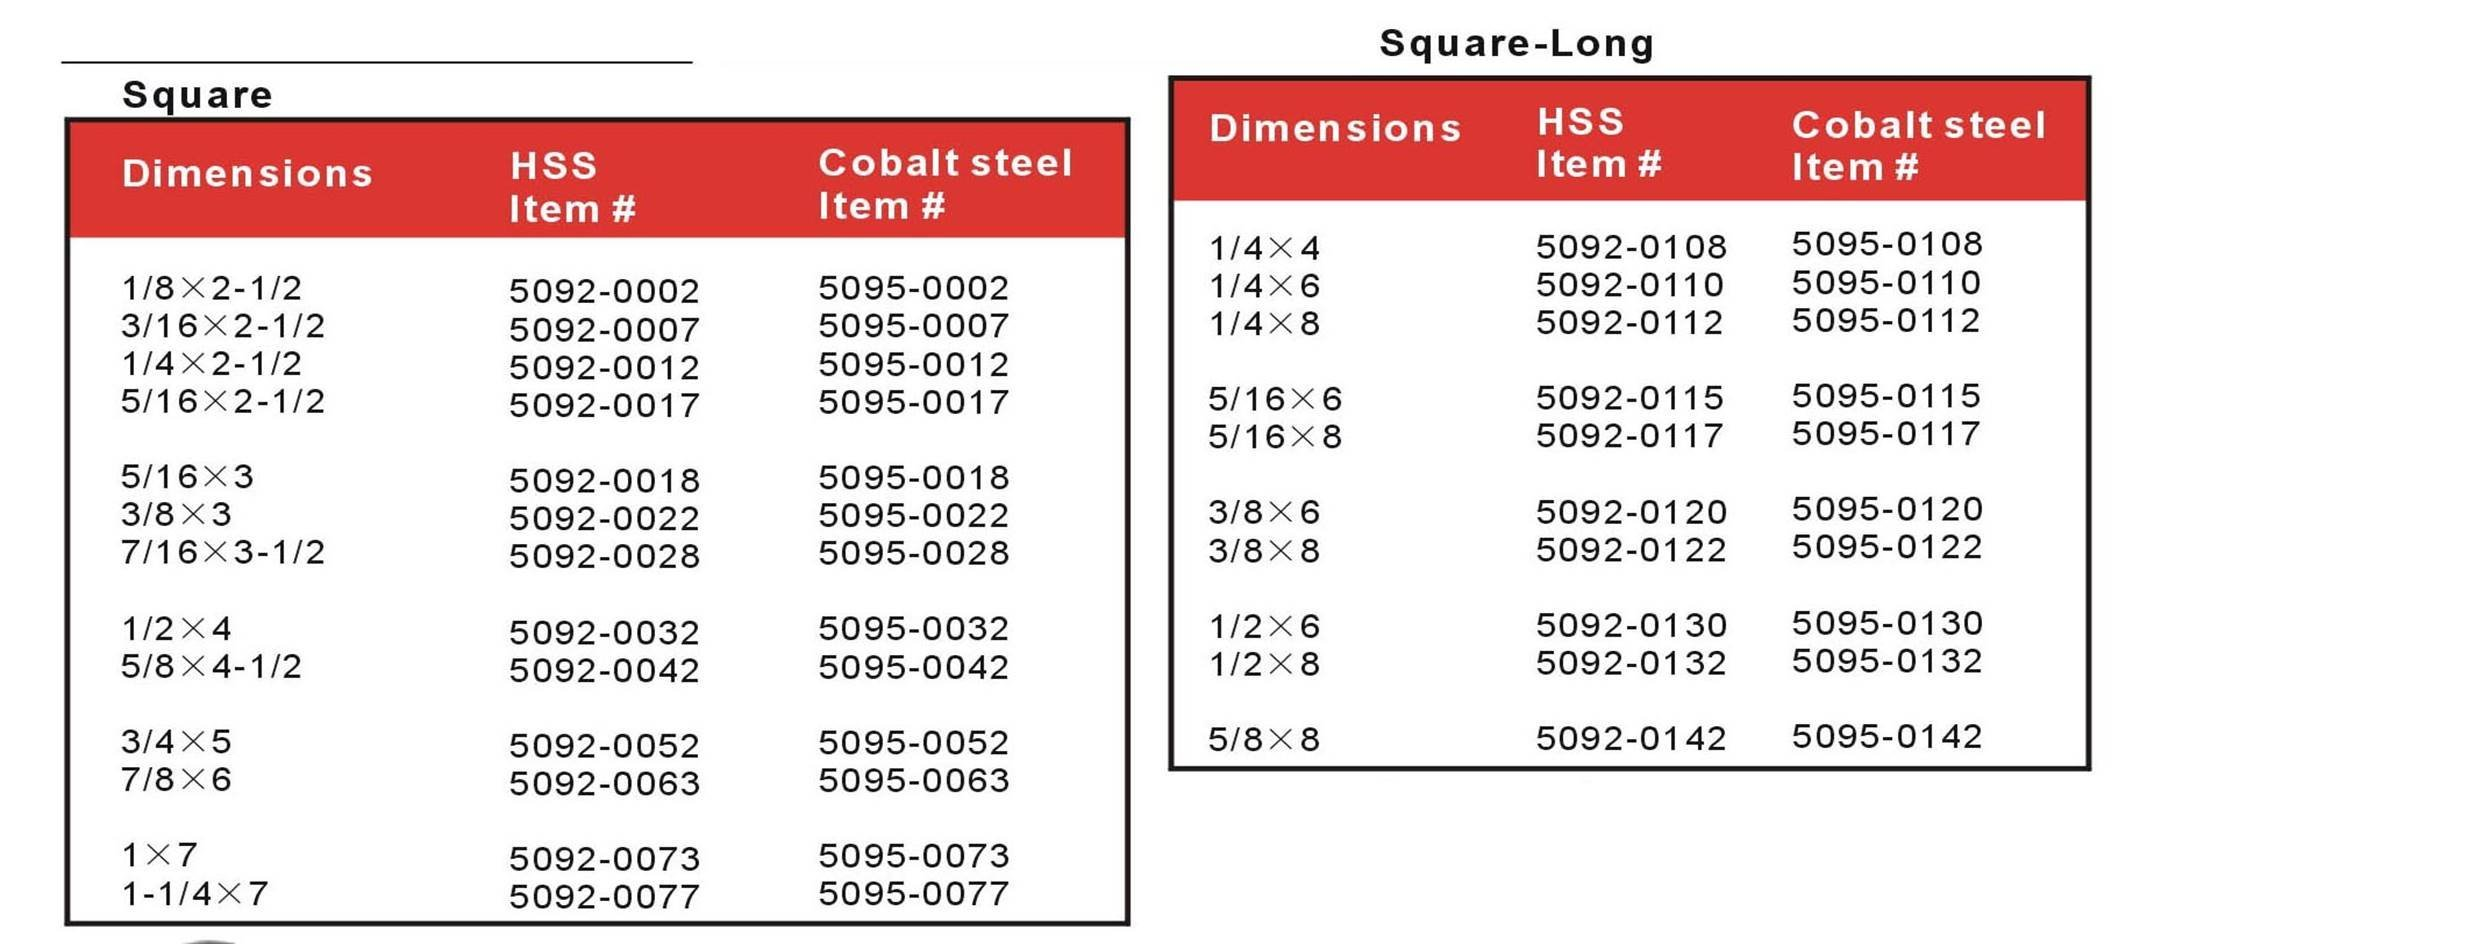 AccusizeTools - 1/2'' x 1/2'' x 4'', HSS +5% Cobalt lathe tool Bits, 5095-0032